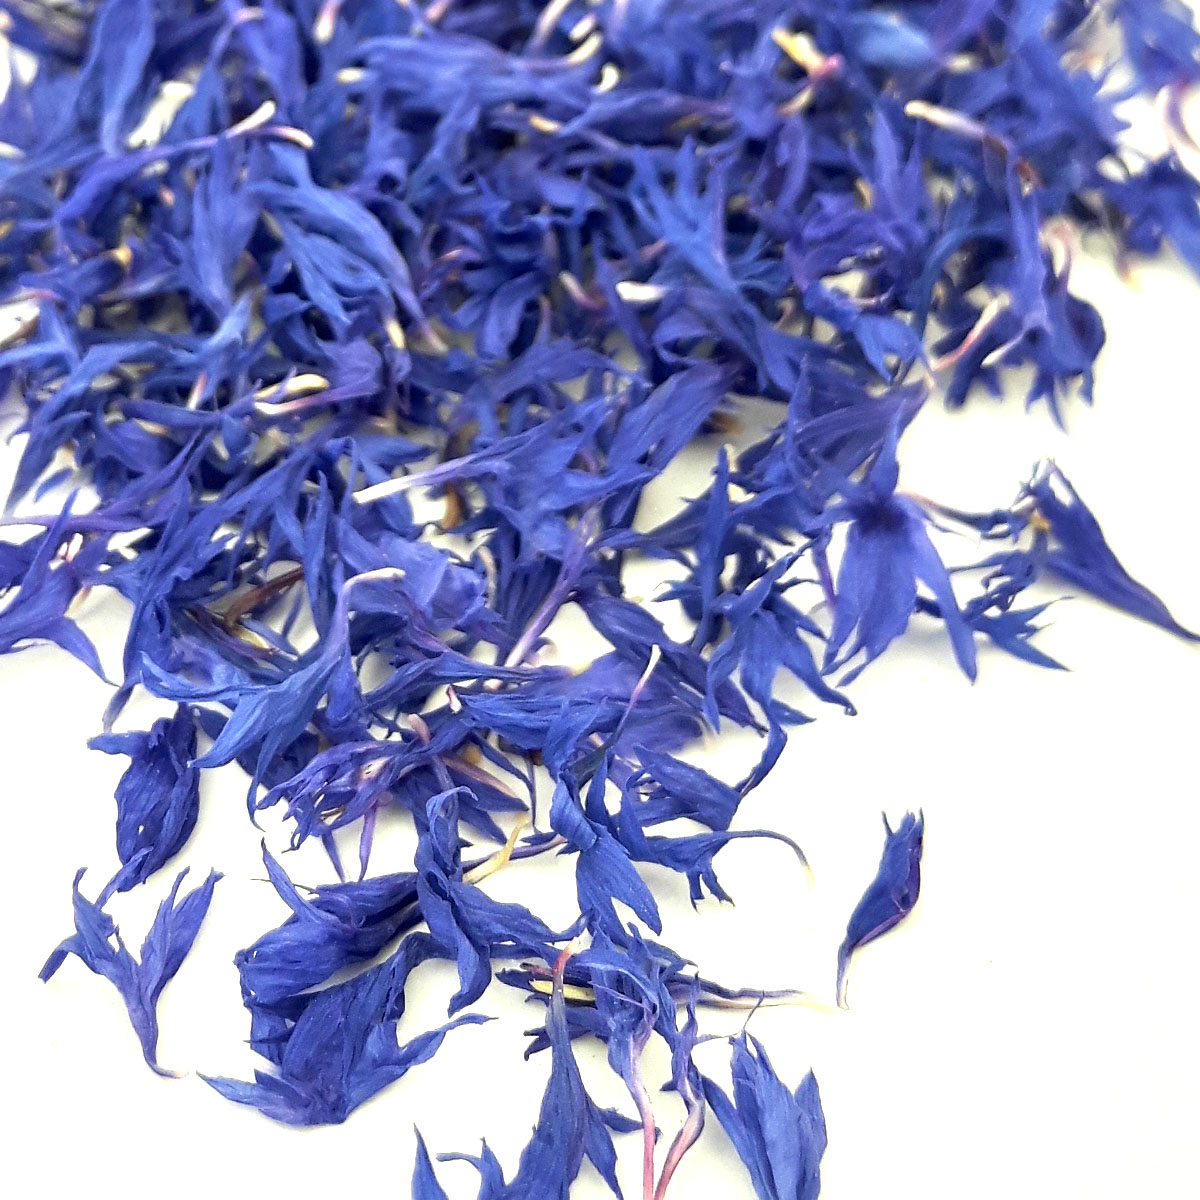 Kornblumen Blau handsortiert